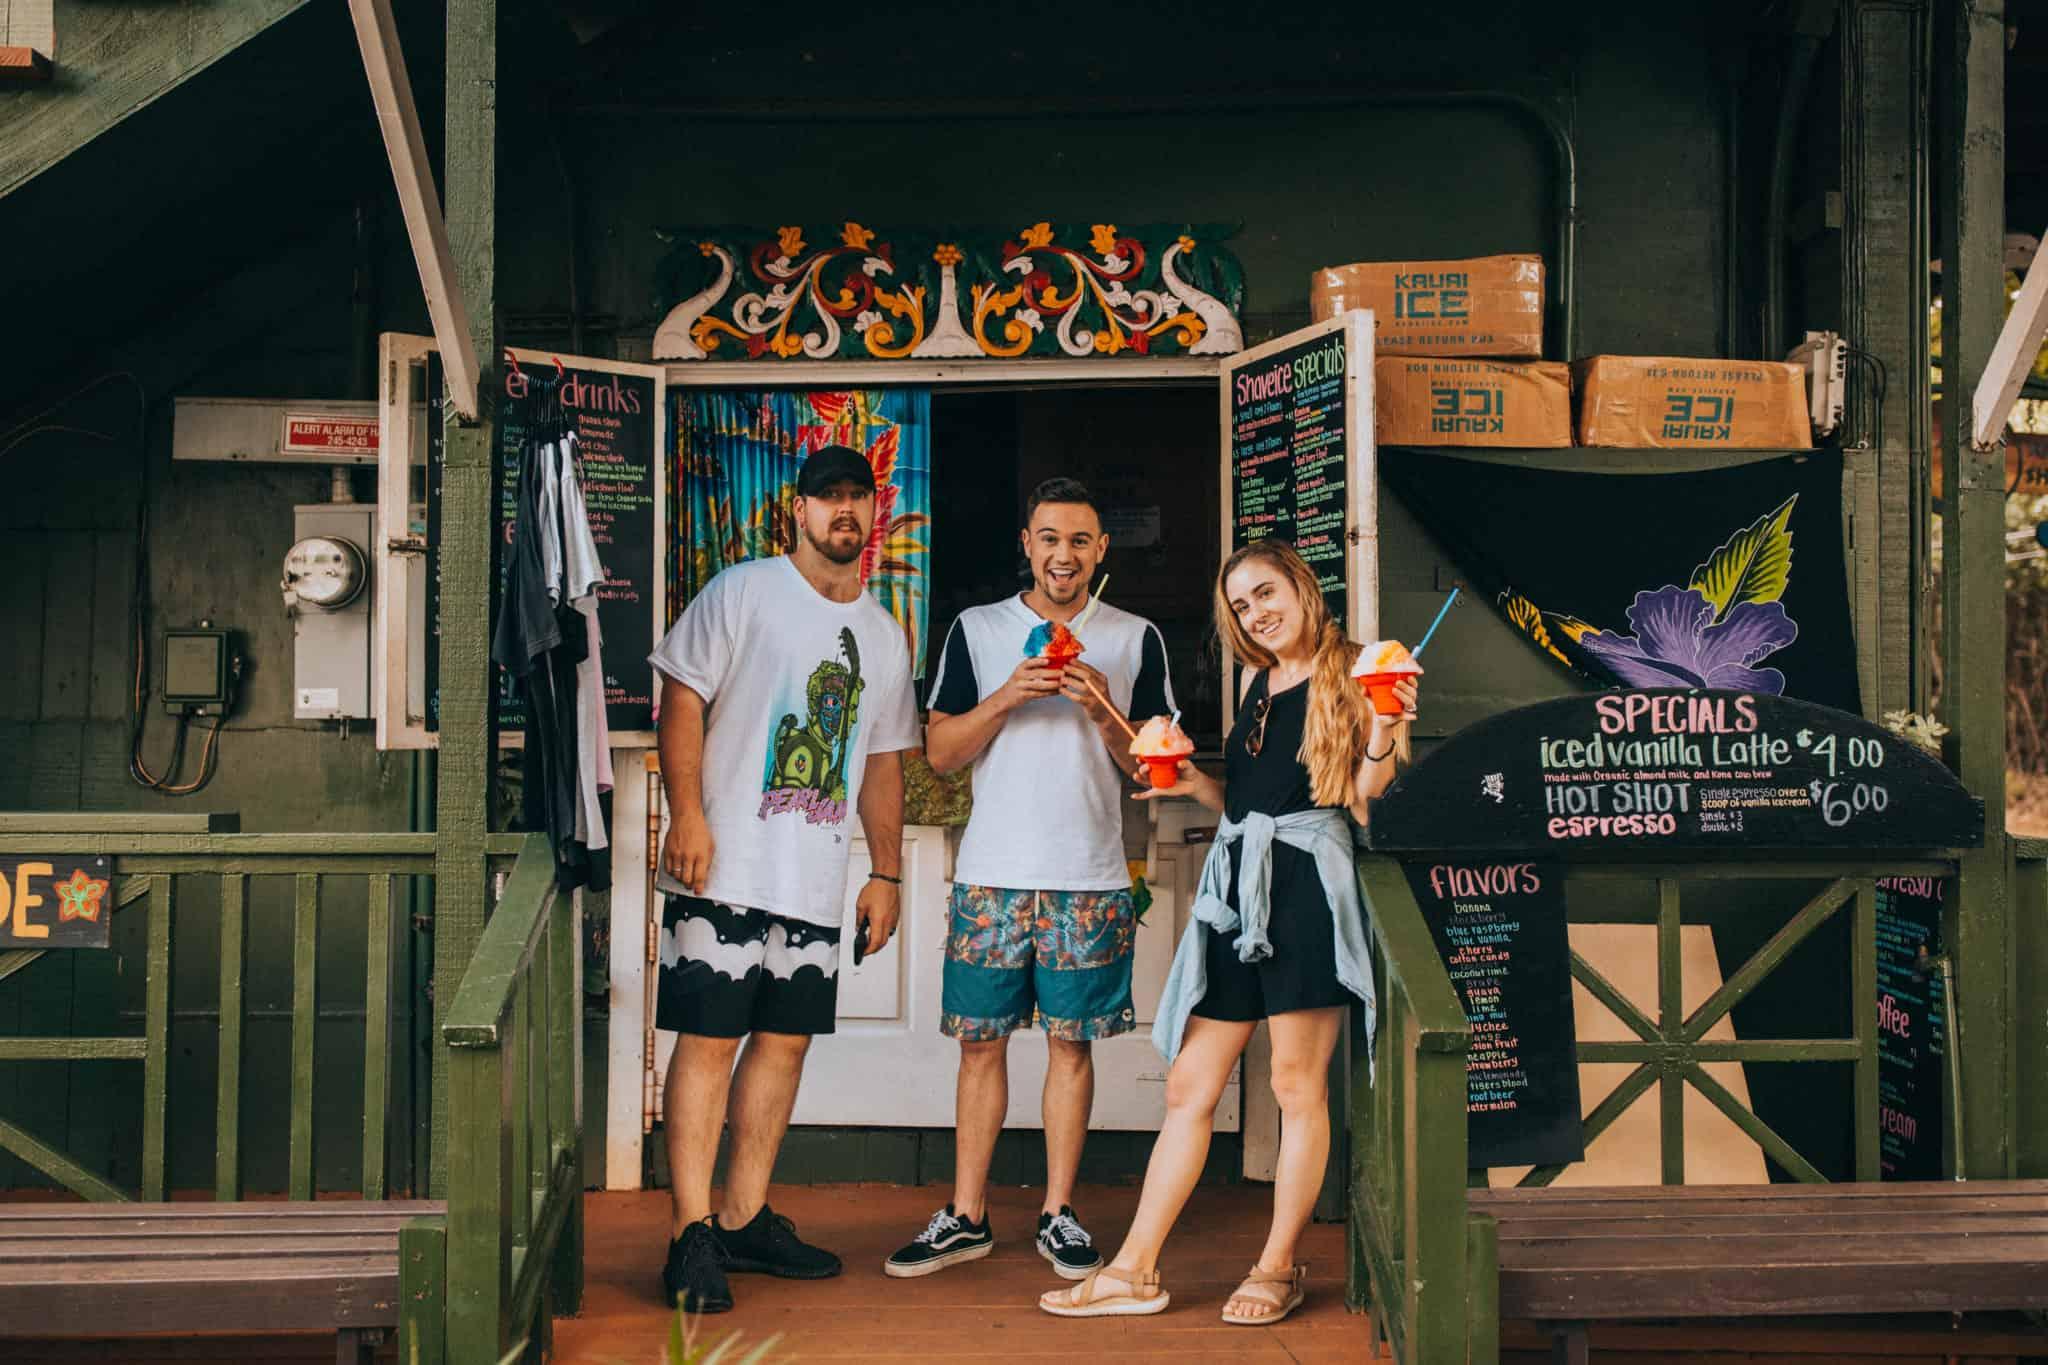 https://www.themandagies.com/2017/10/kauai-helicopter-tour/